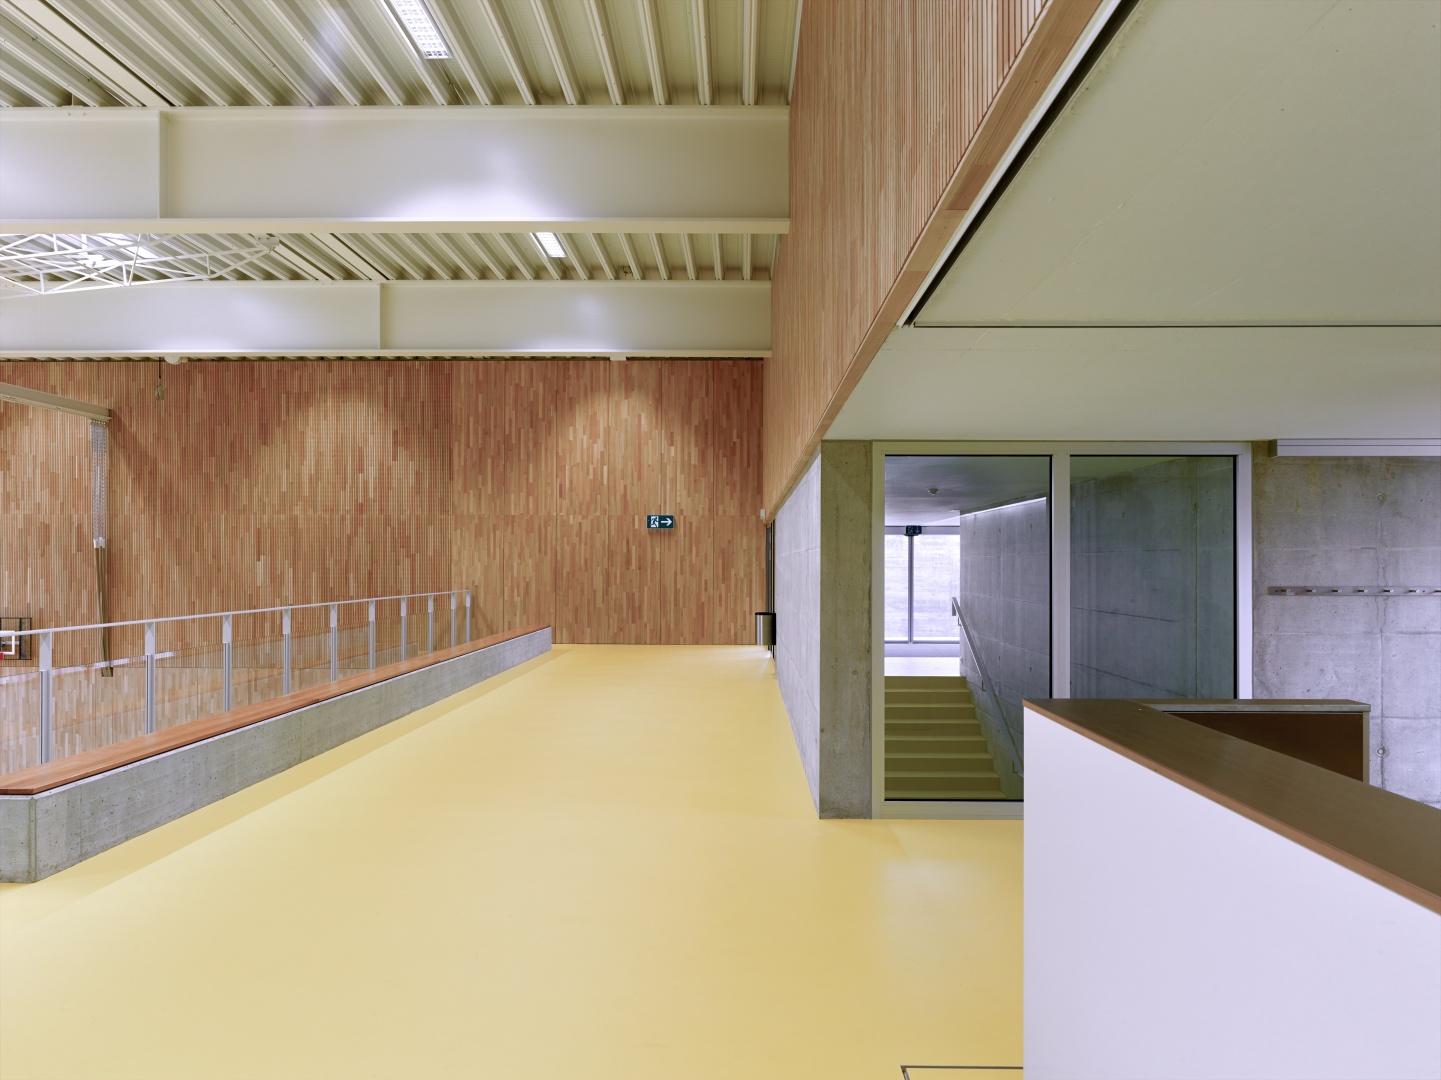 Galerie © Architekturfotografie Gempeler Alexander Gempeler Fotograf SBF|SWB Seidenweg 8a Postfach 524 CH-3000 Bern 9